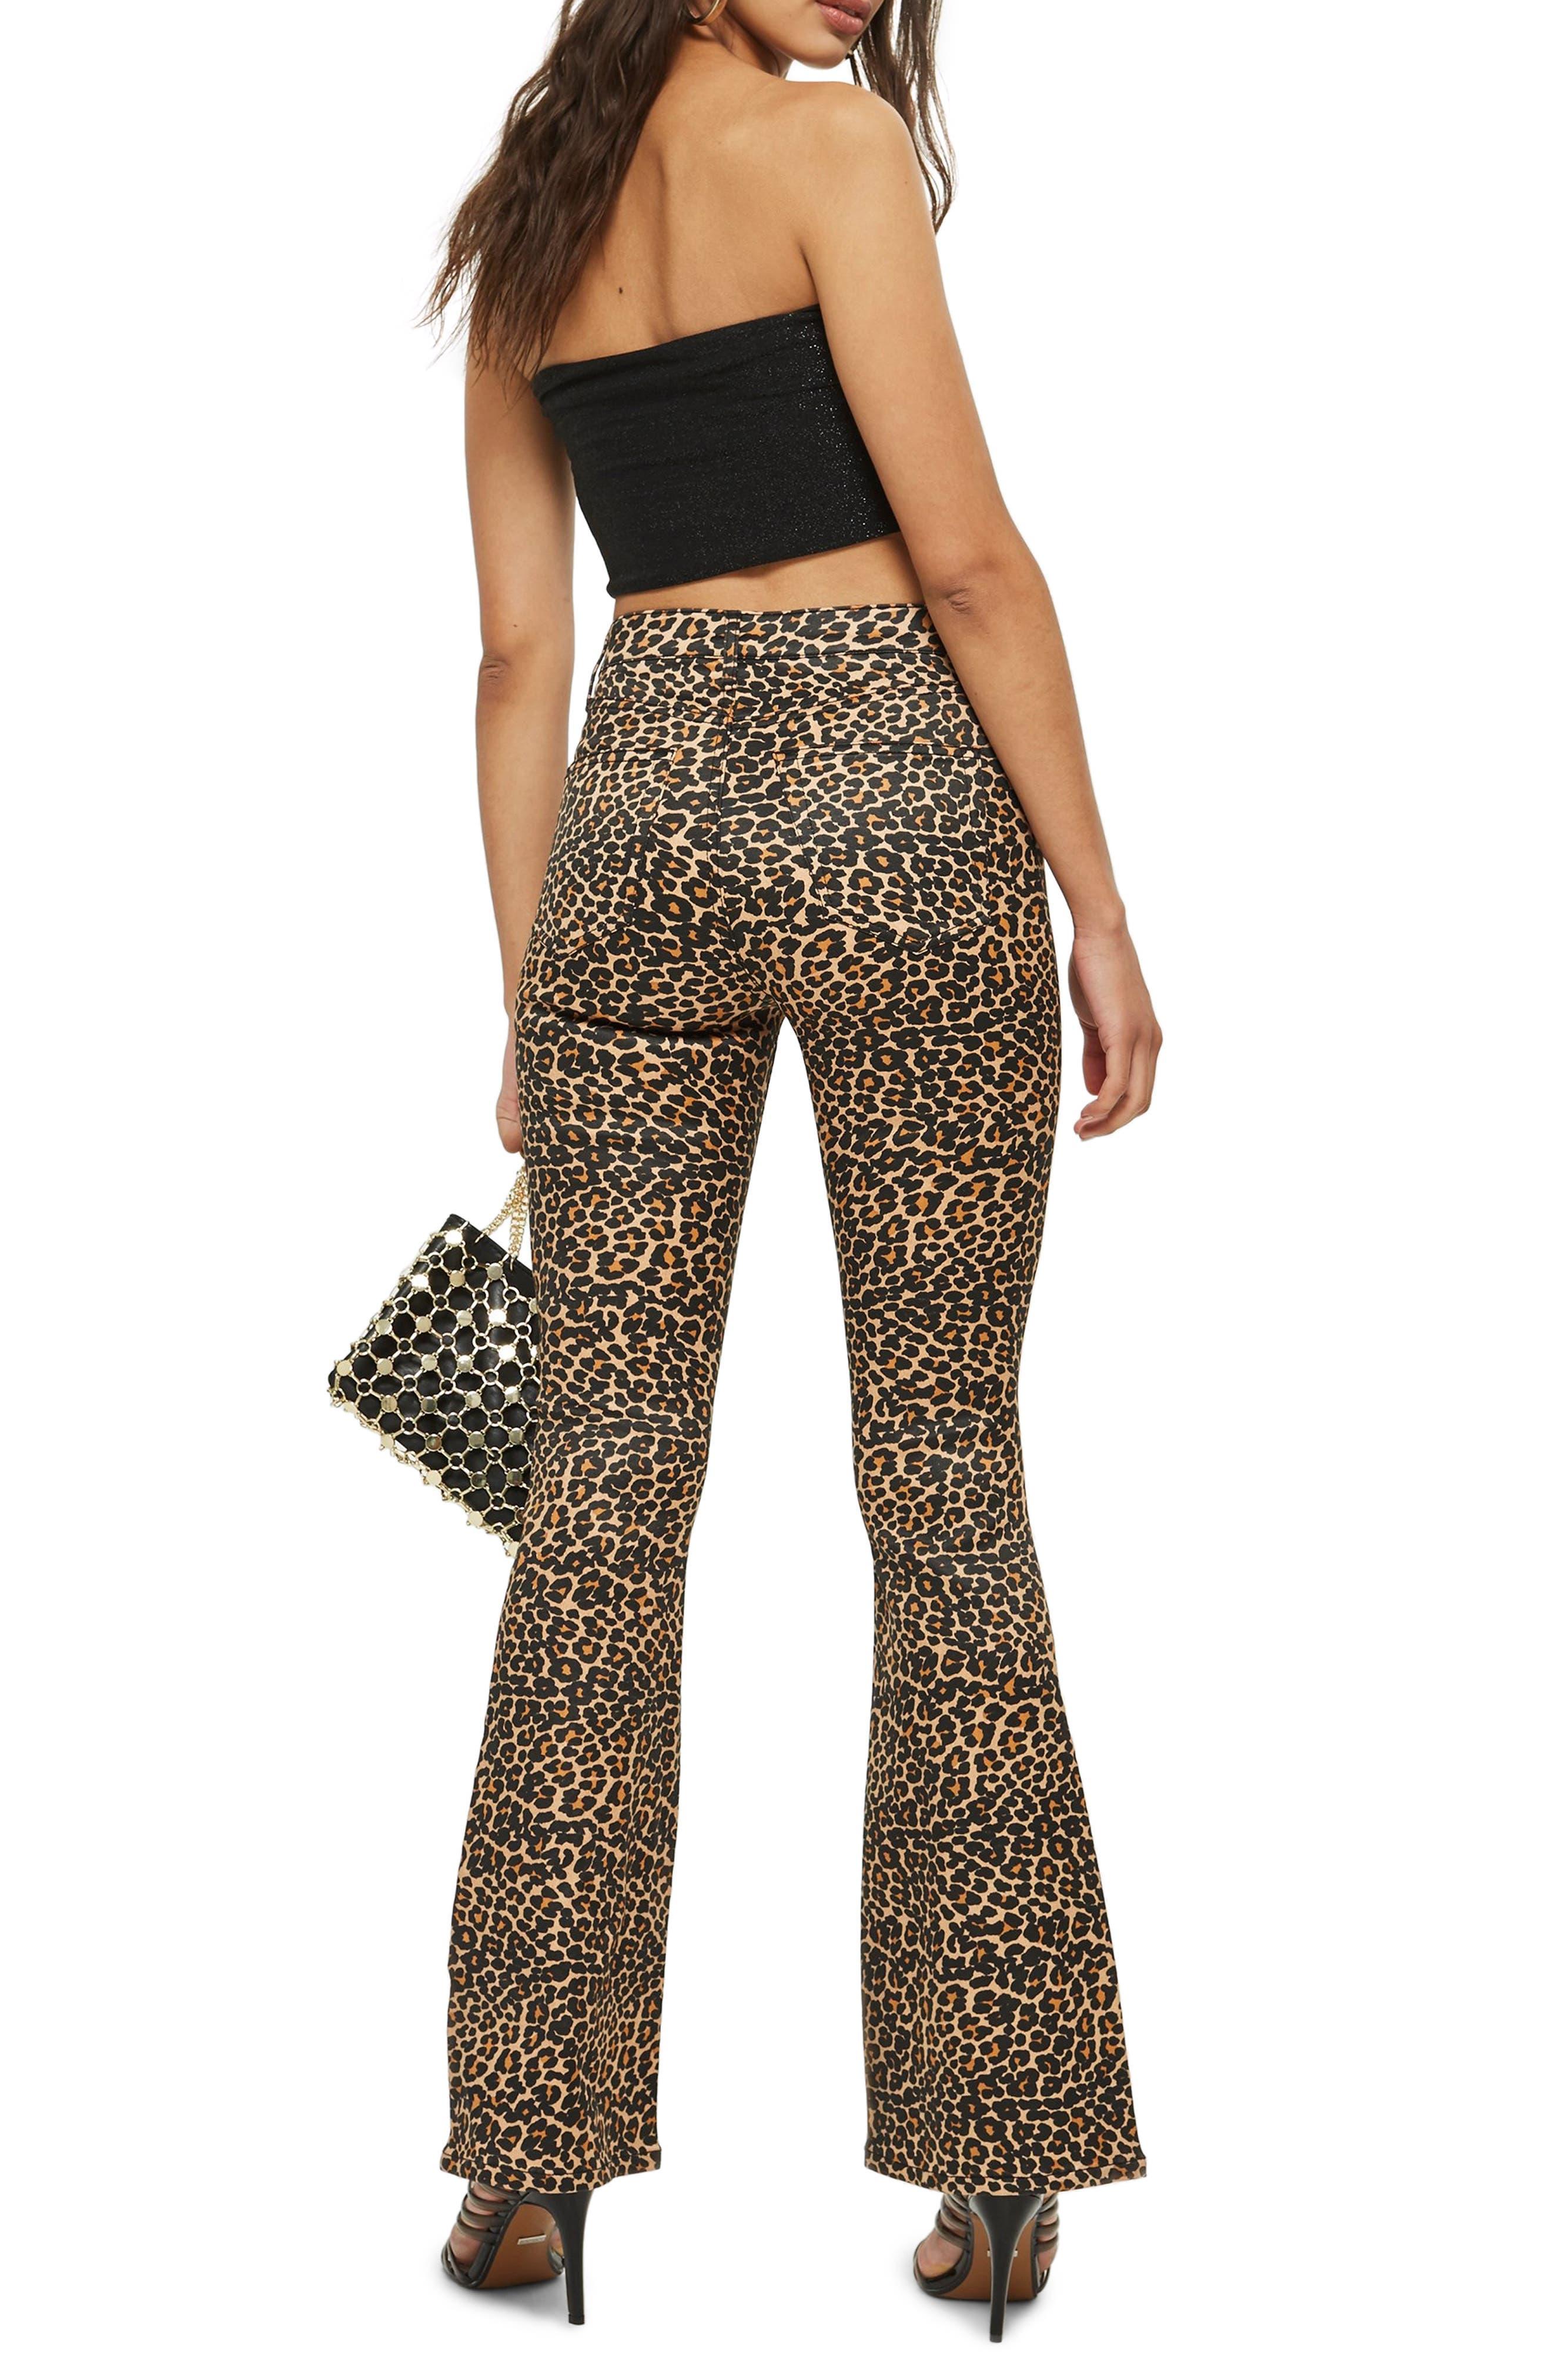 MOTO Leopard Print Flare Jeans,                             Alternate thumbnail 2, color,                             BROWN MULTI